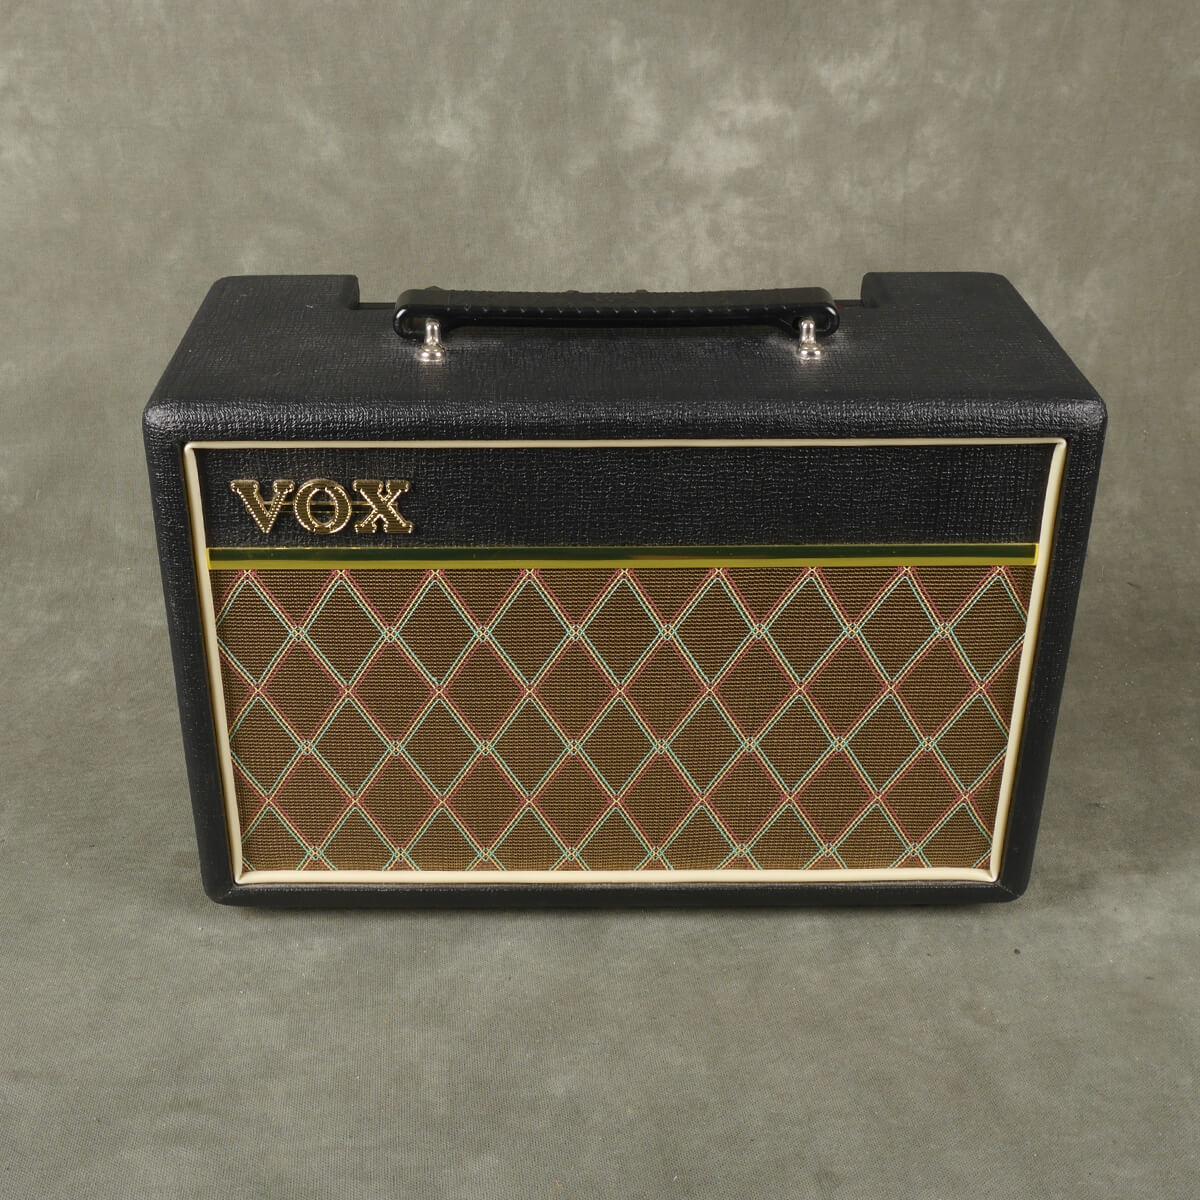 Vox Pathfinder 10 Combo Amplifier - 2nd Hand